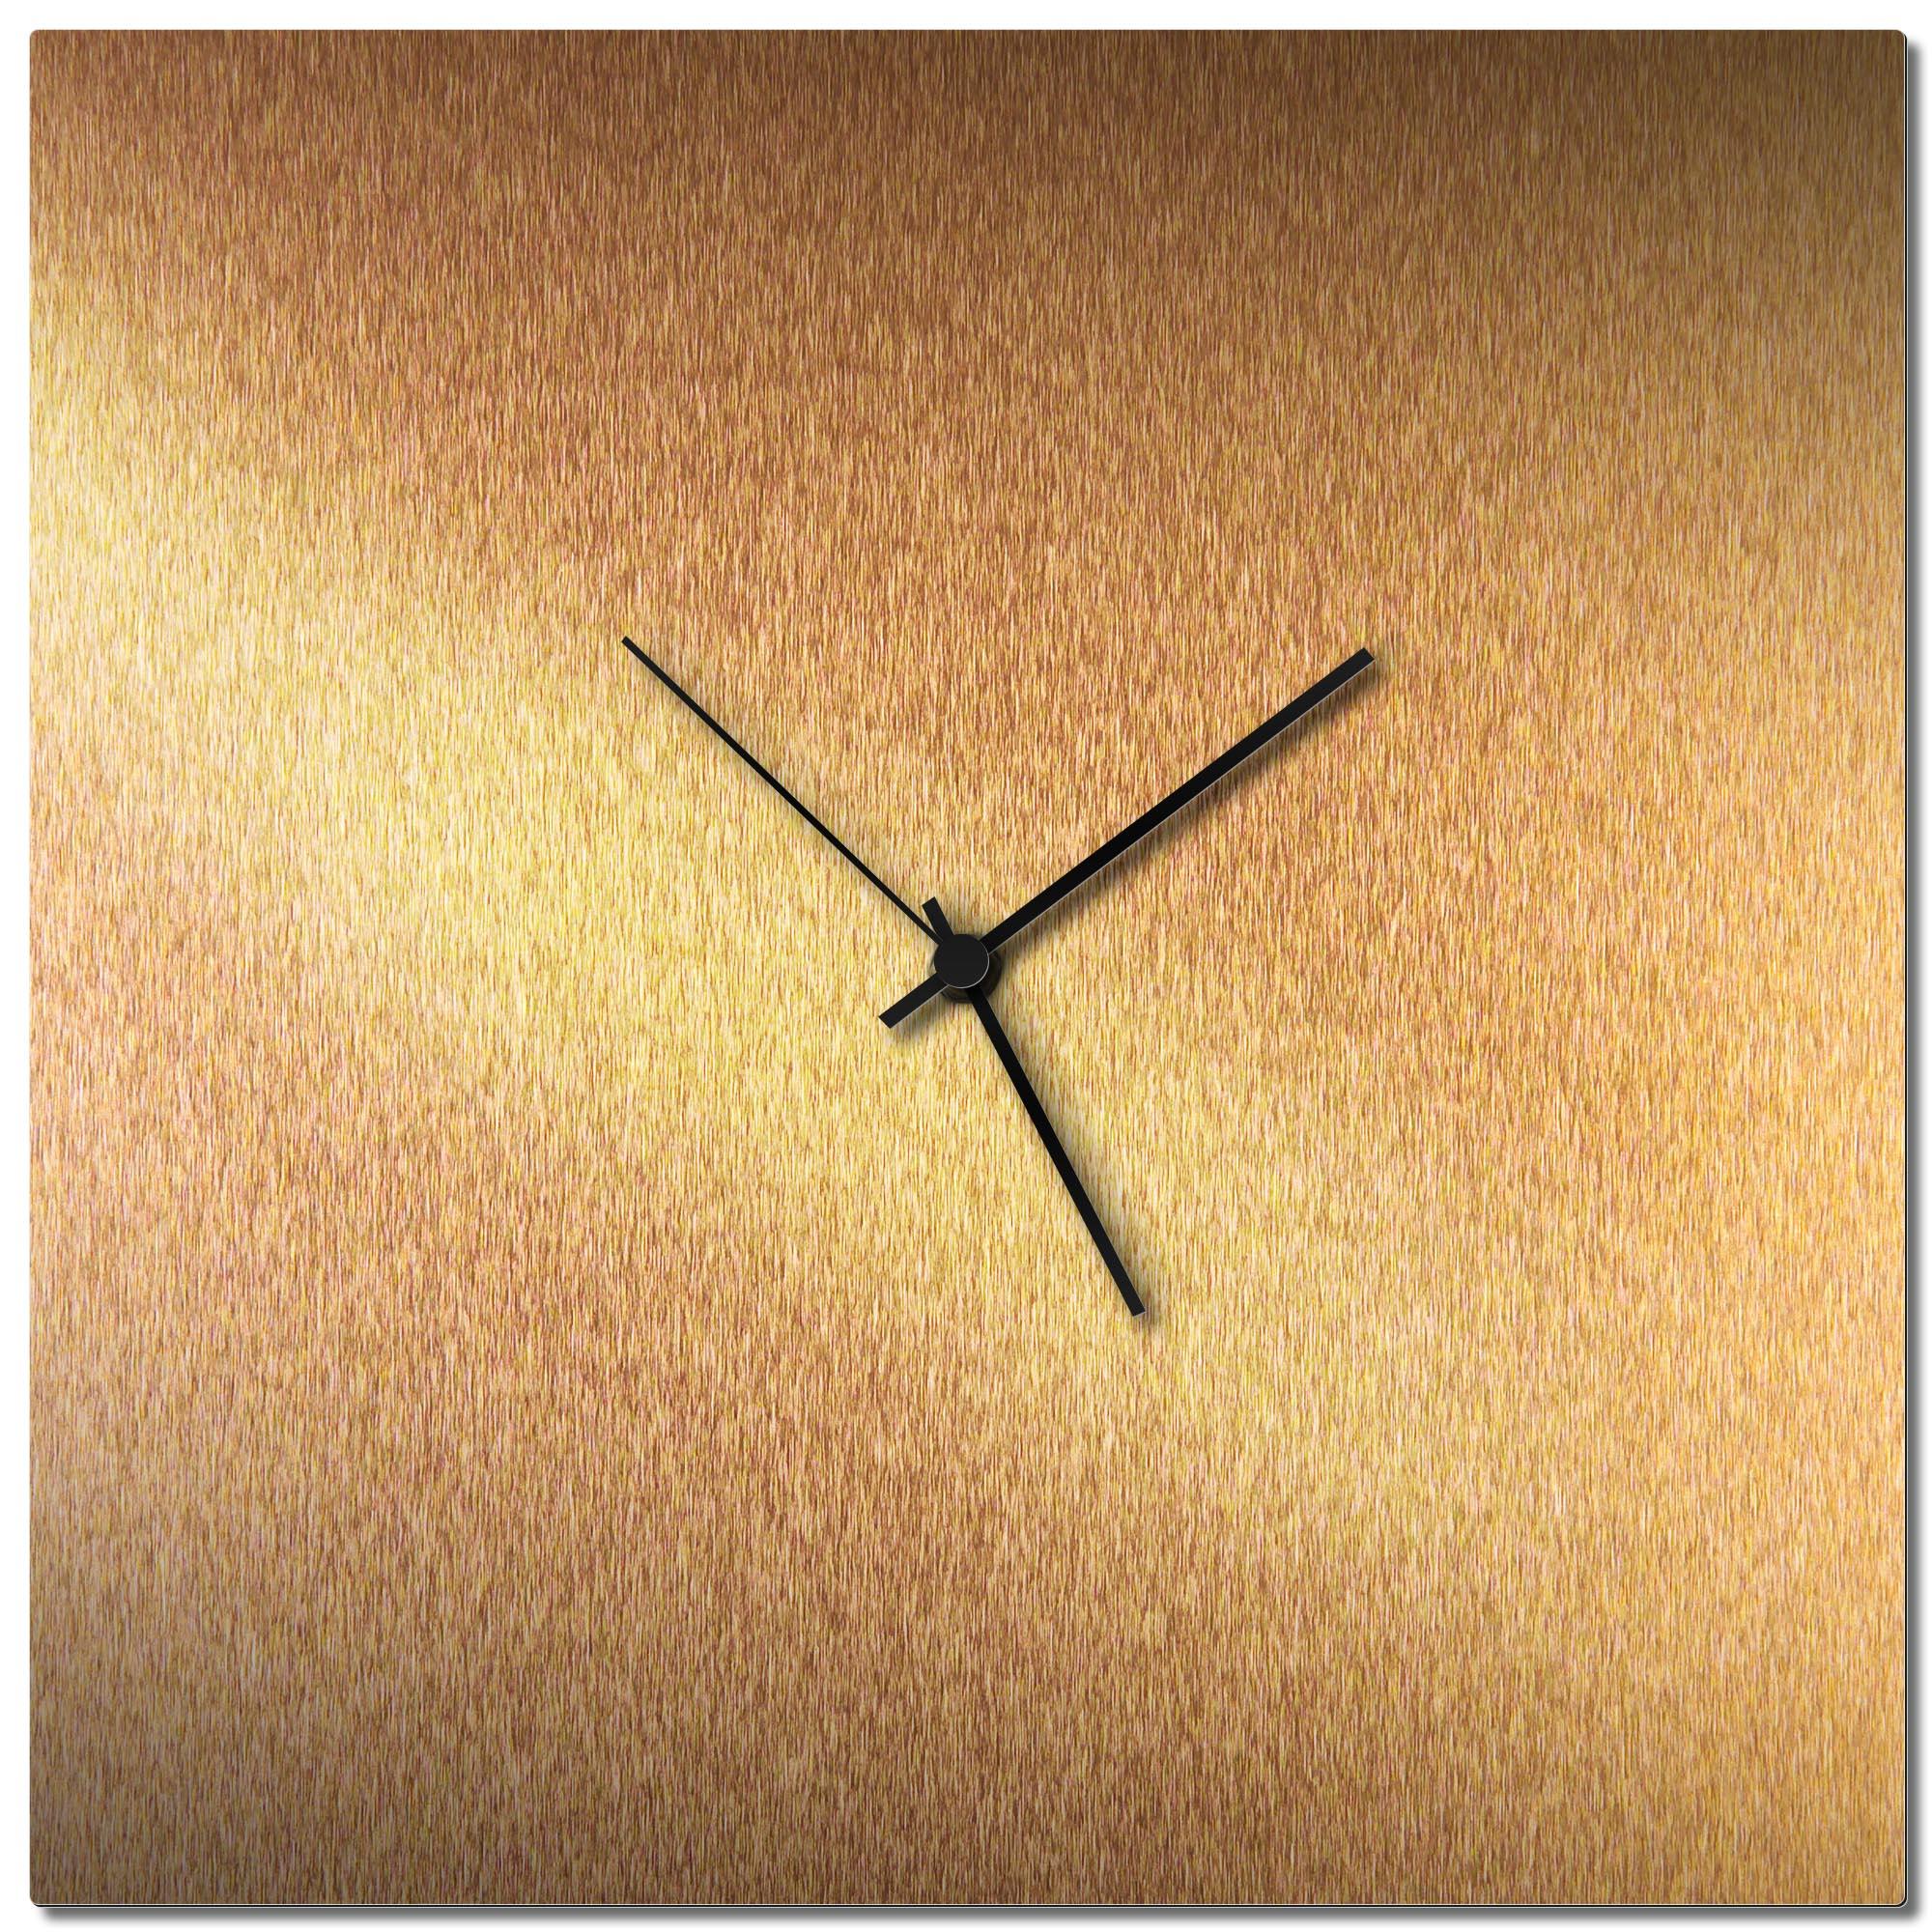 Adam Schwoeppe 'Bronzesmith Square Clock Black' Midcentury Modern Style Wall Clock